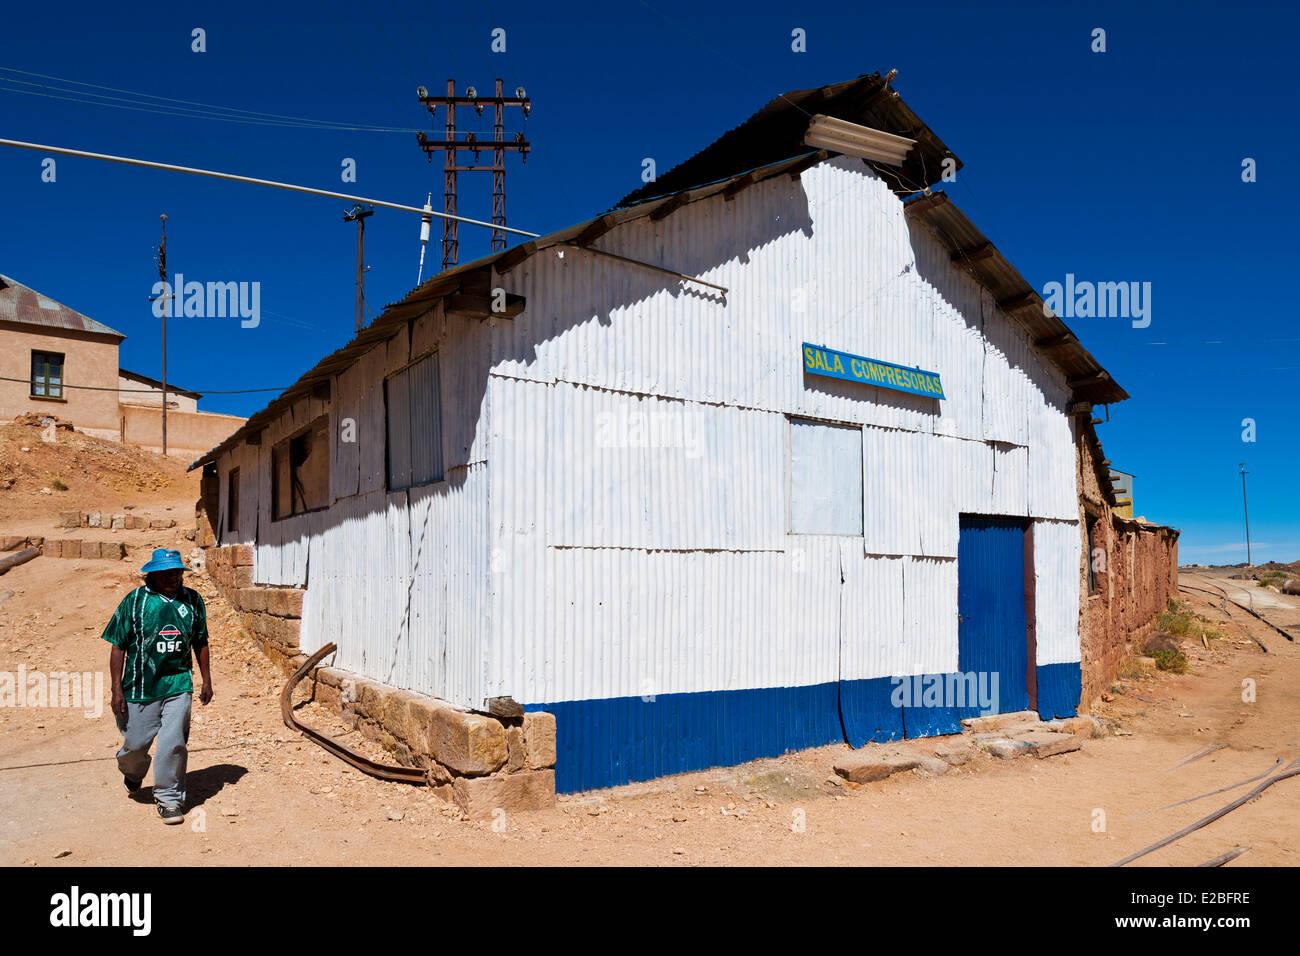 Bolivia, Potosi Department, Pulacayo, disused silver mine - Stock Image